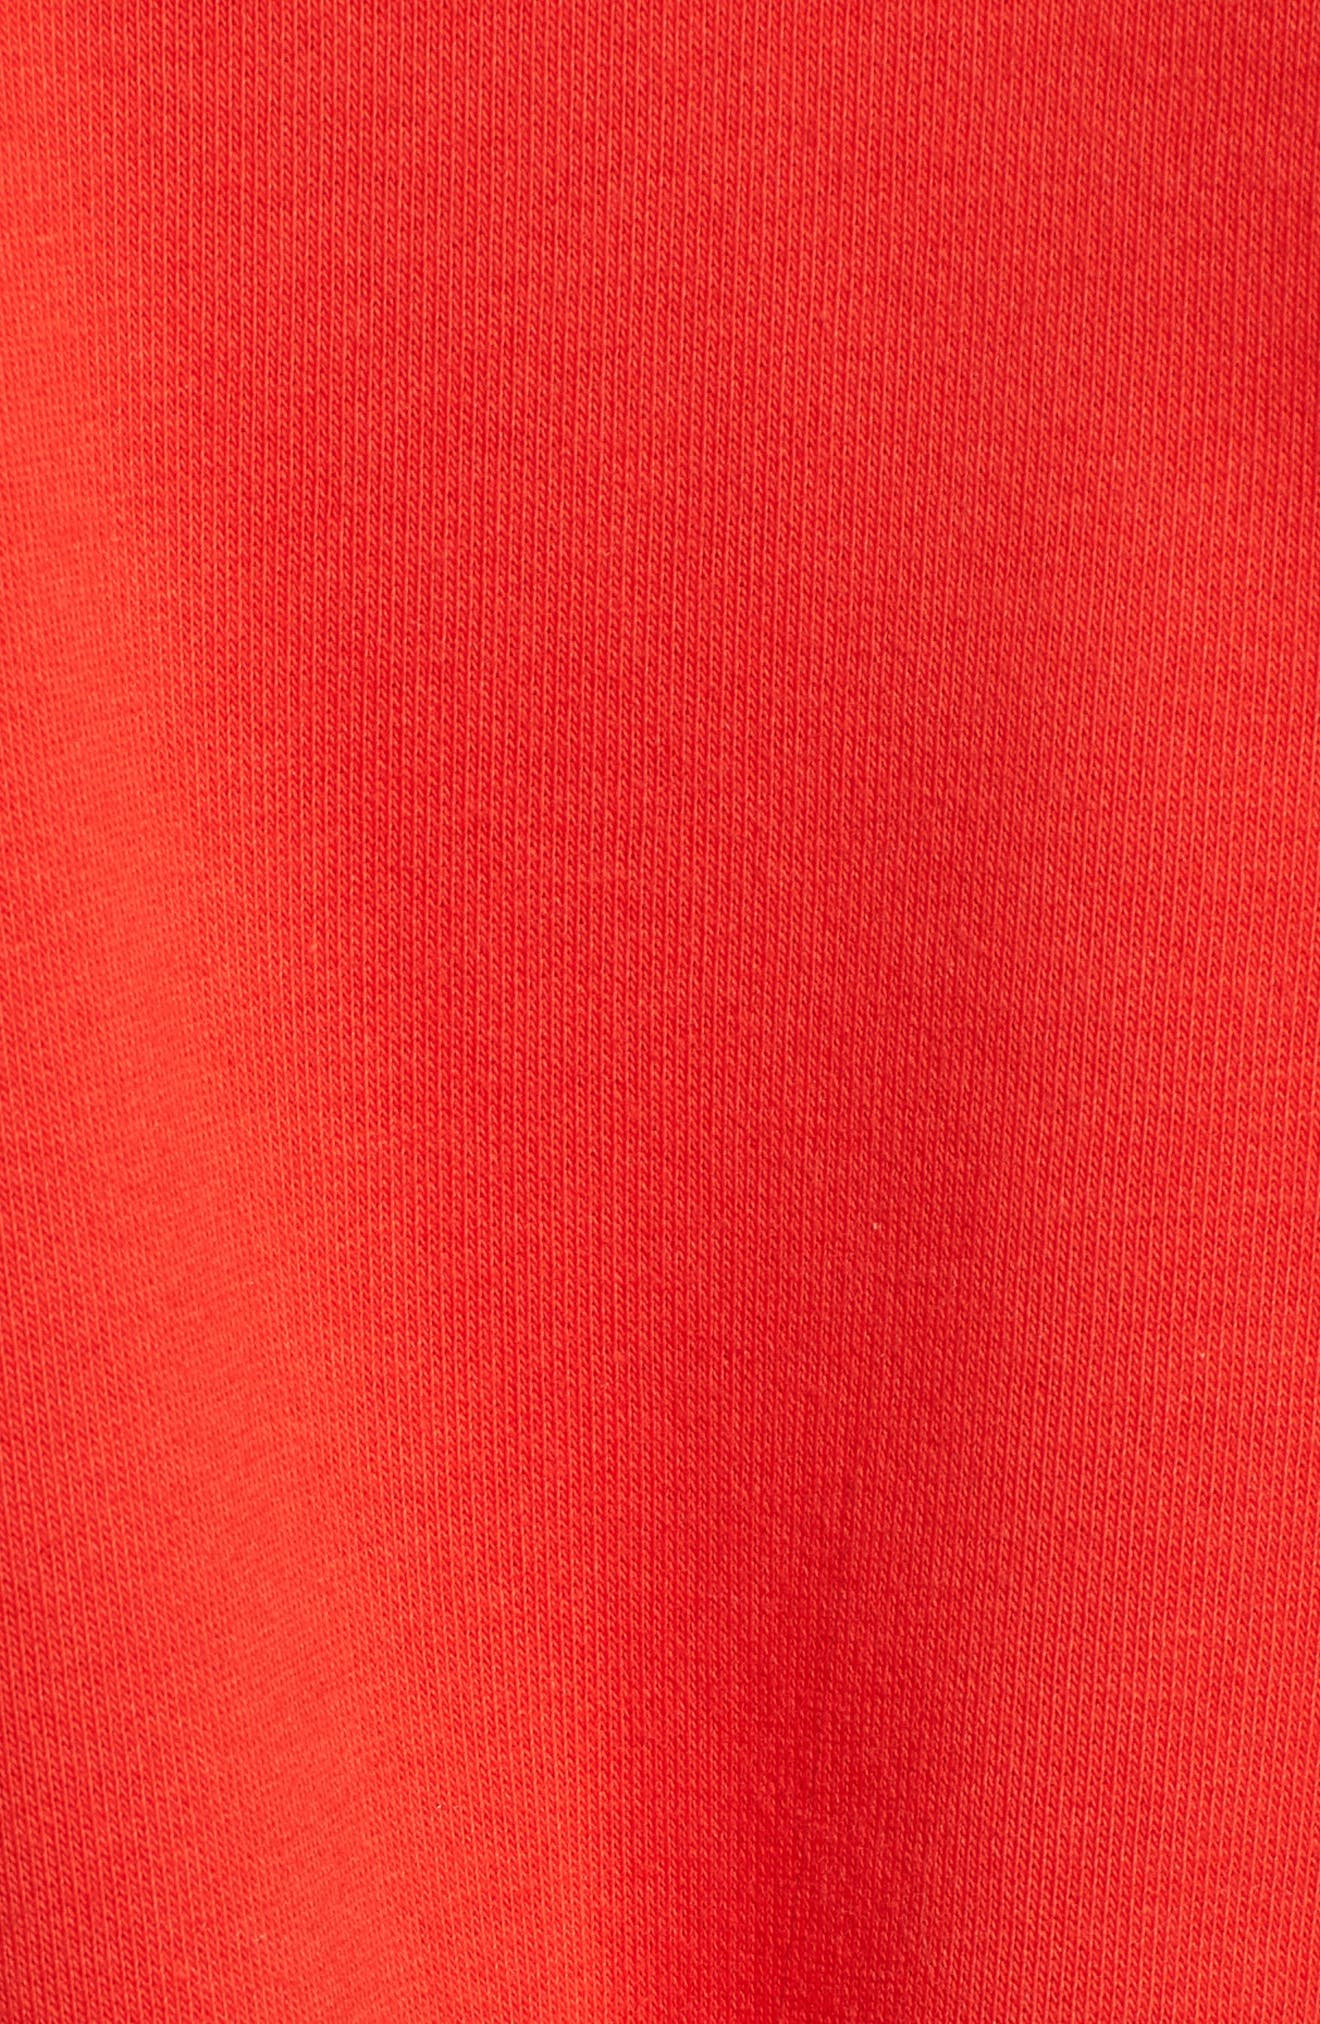 x Gigi Hadid Sweatshirt Dress,                             Alternate thumbnail 5, color,                             Flame Scarlet